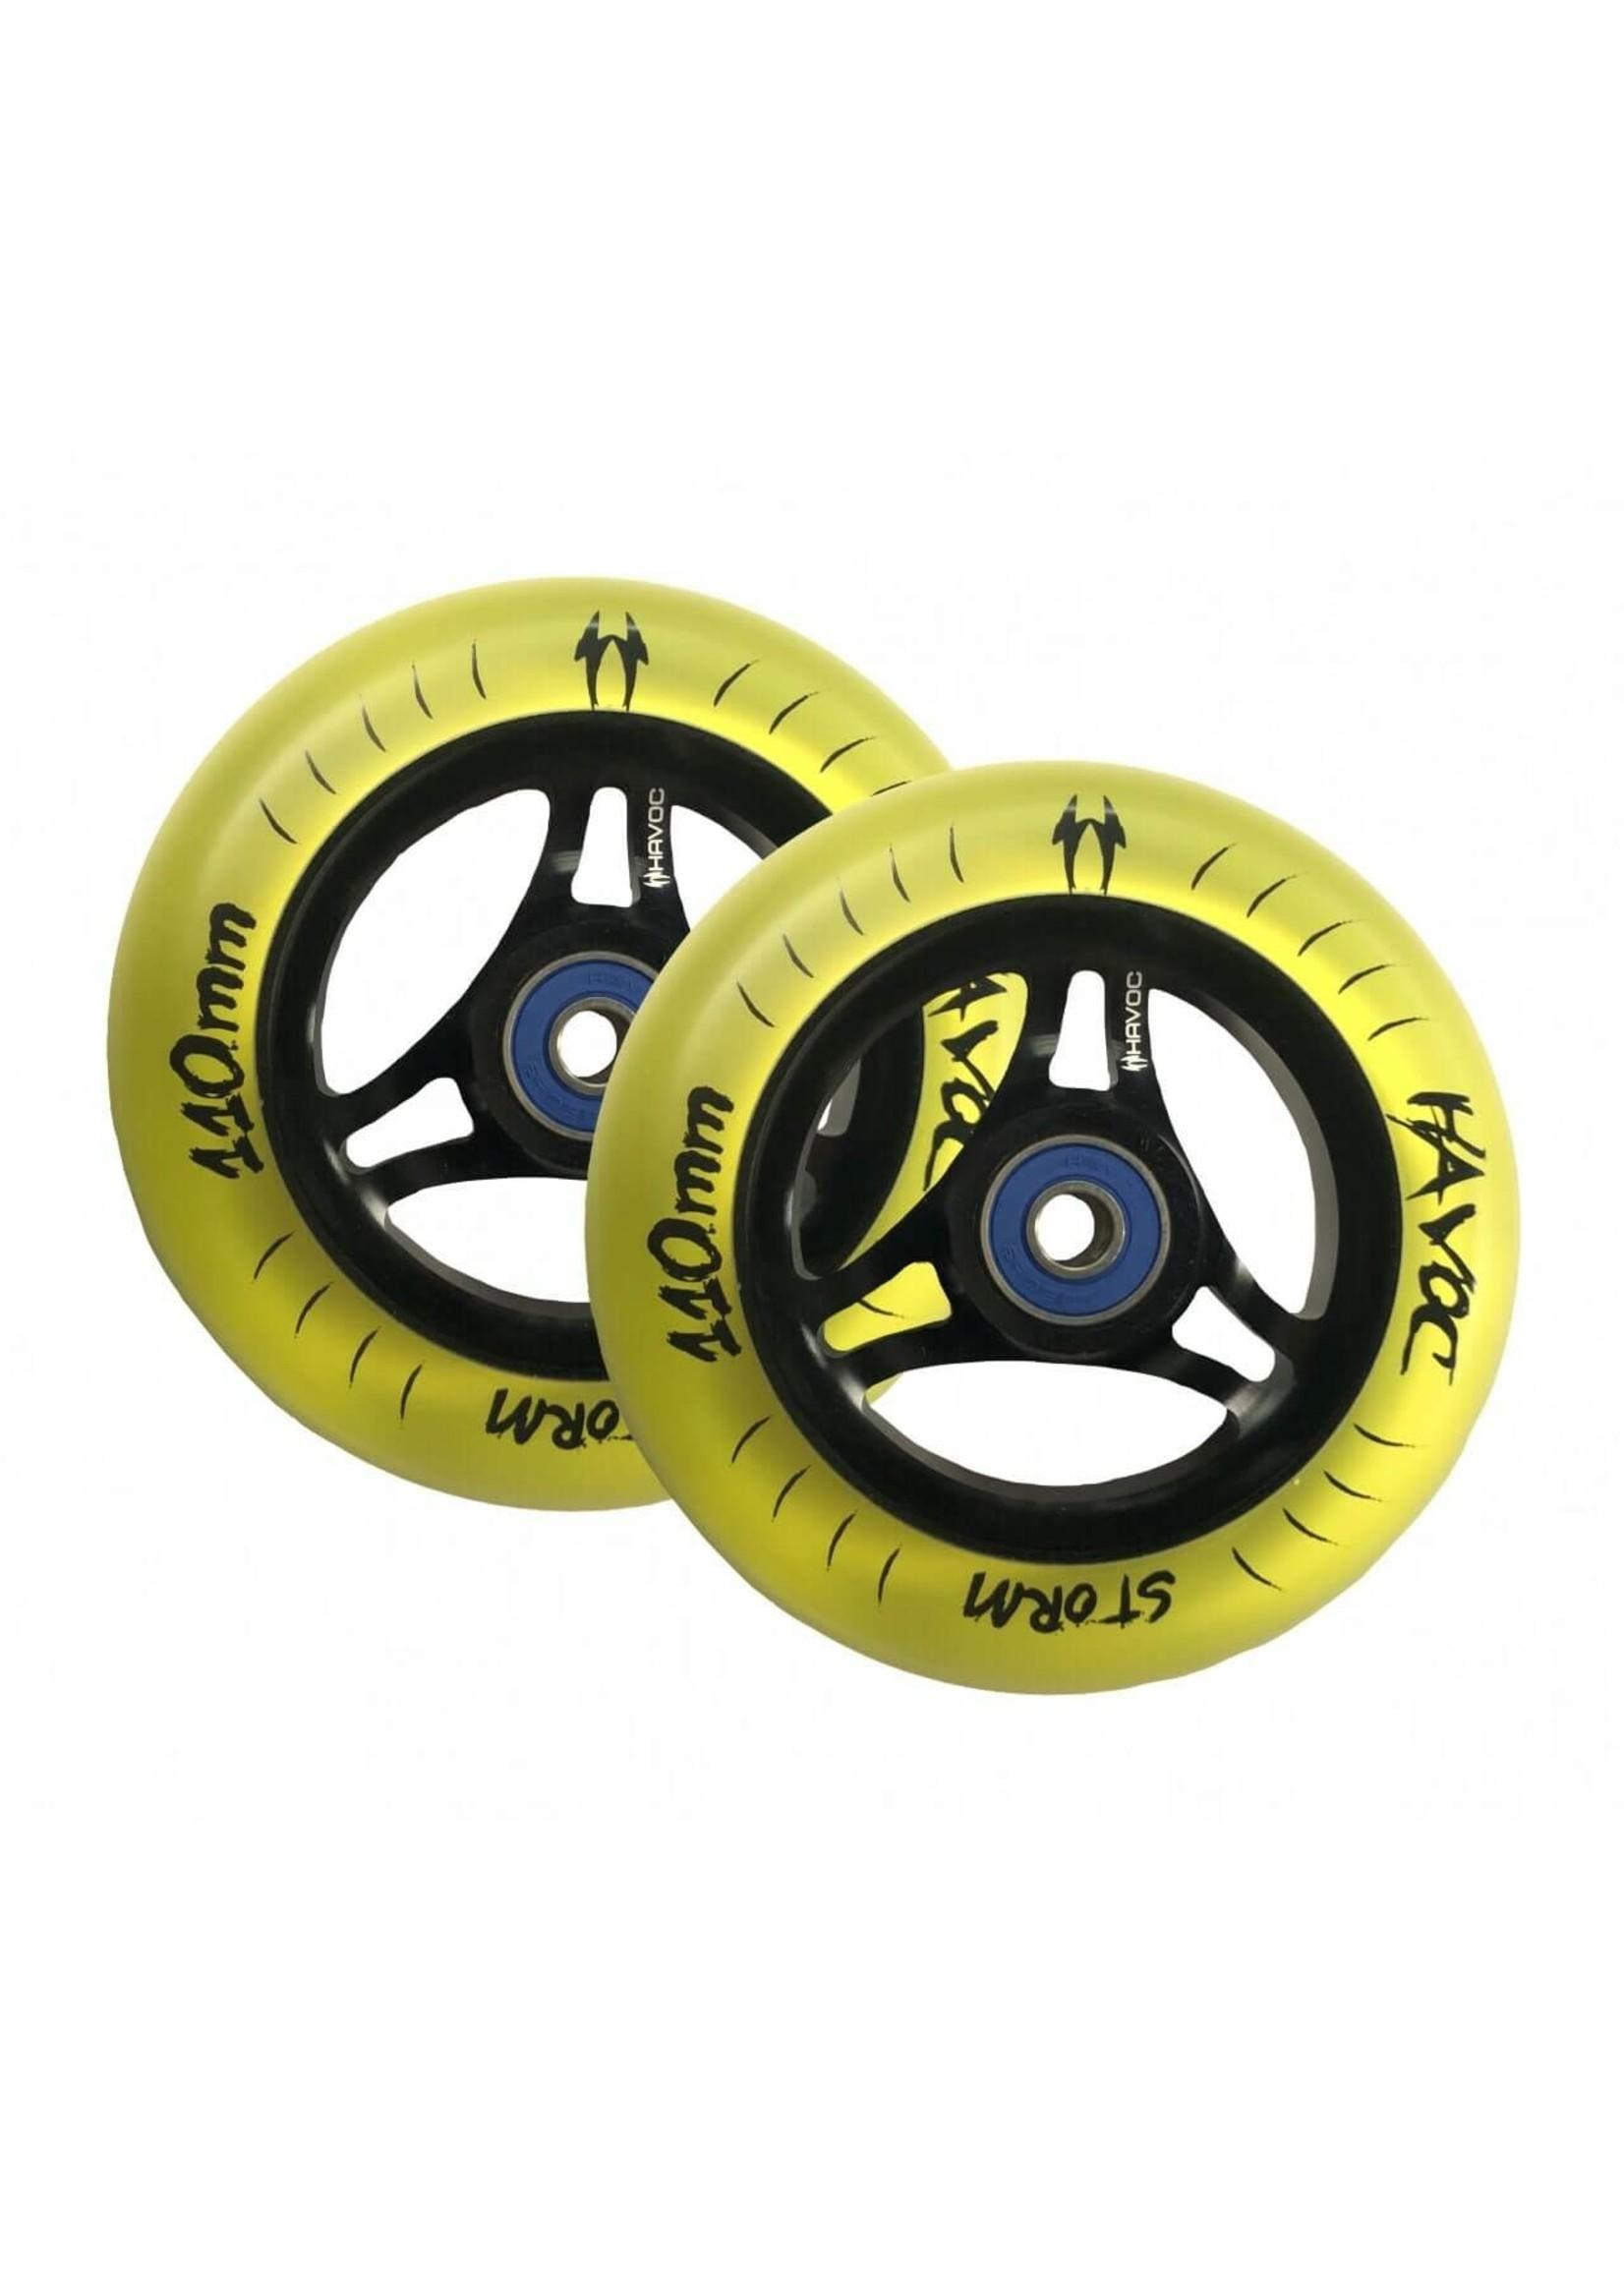 Havoc Havoc - Storm Wheels - 110mm